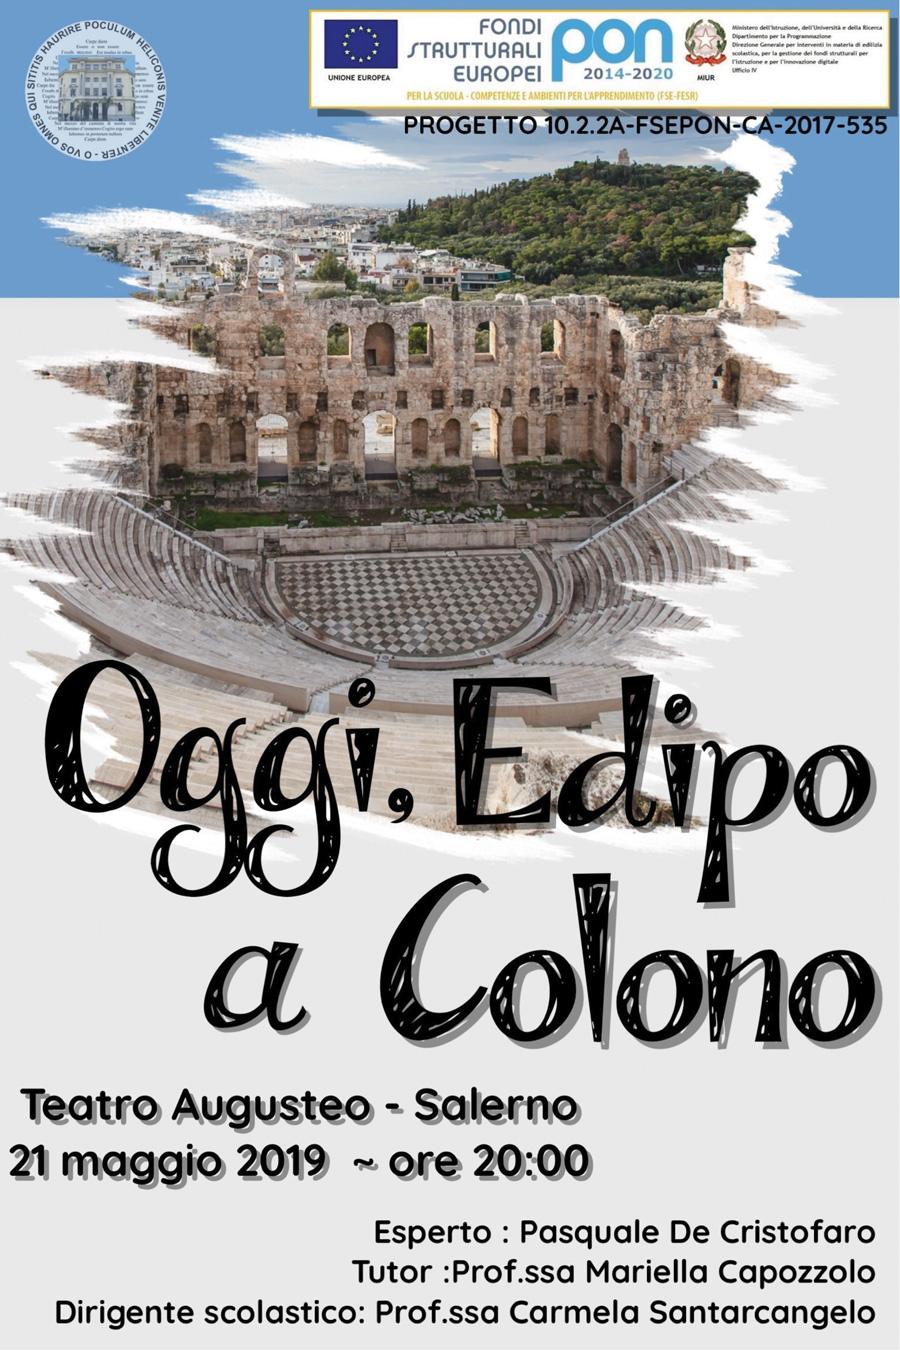 Laboratorio Teatrale: Teatro Augusteo, Salerno. 21/5/2019 ore 20:00